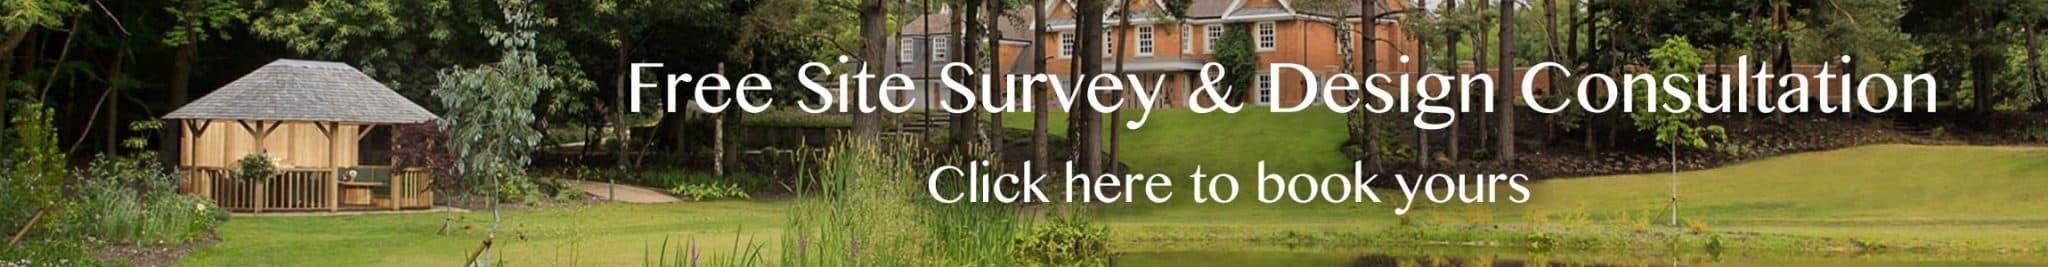 Free Site Survey and Design Consultation